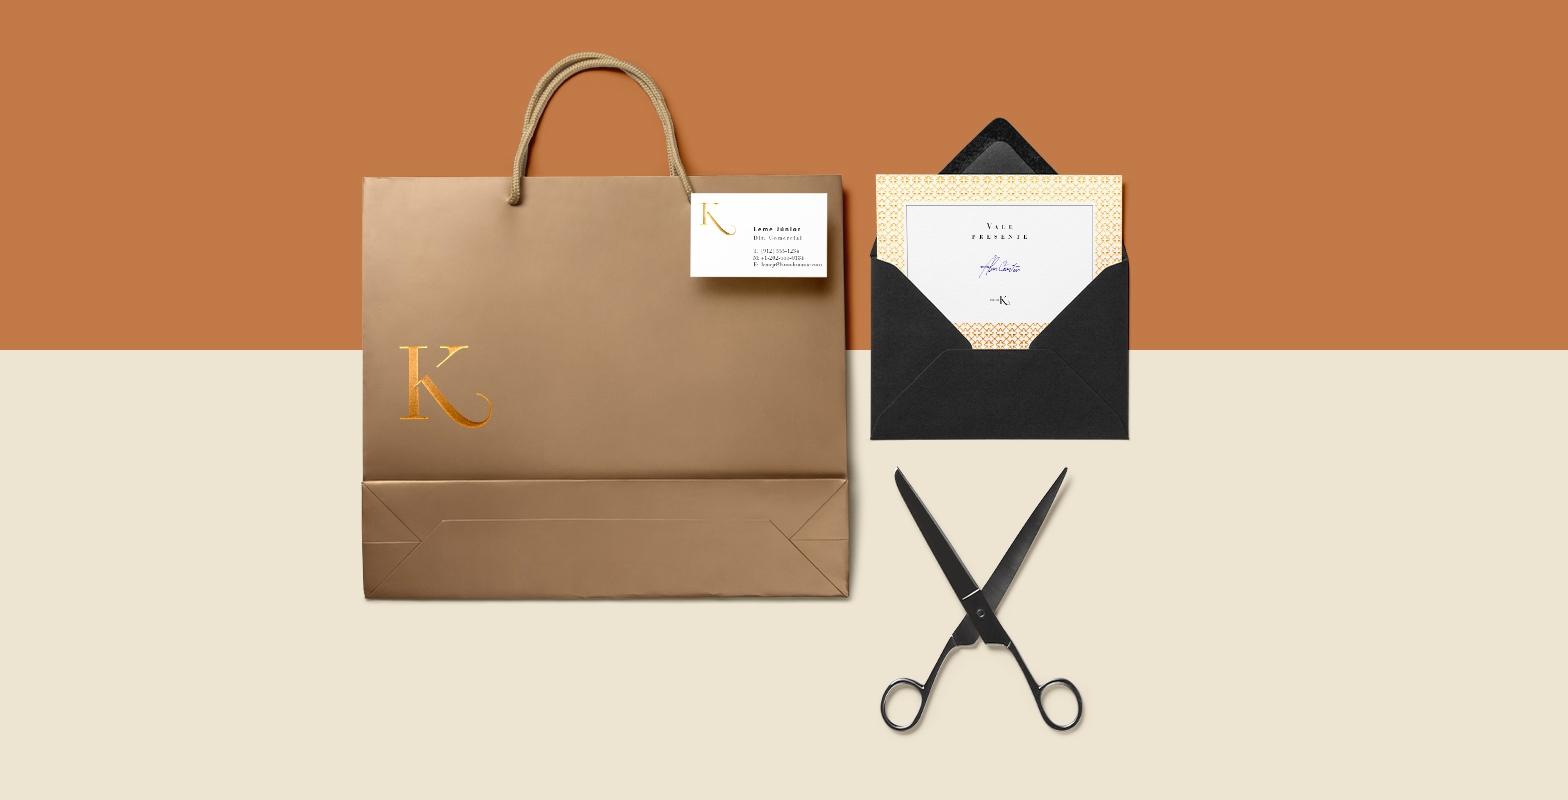 Casa K - Identidade visual e Branding (3)